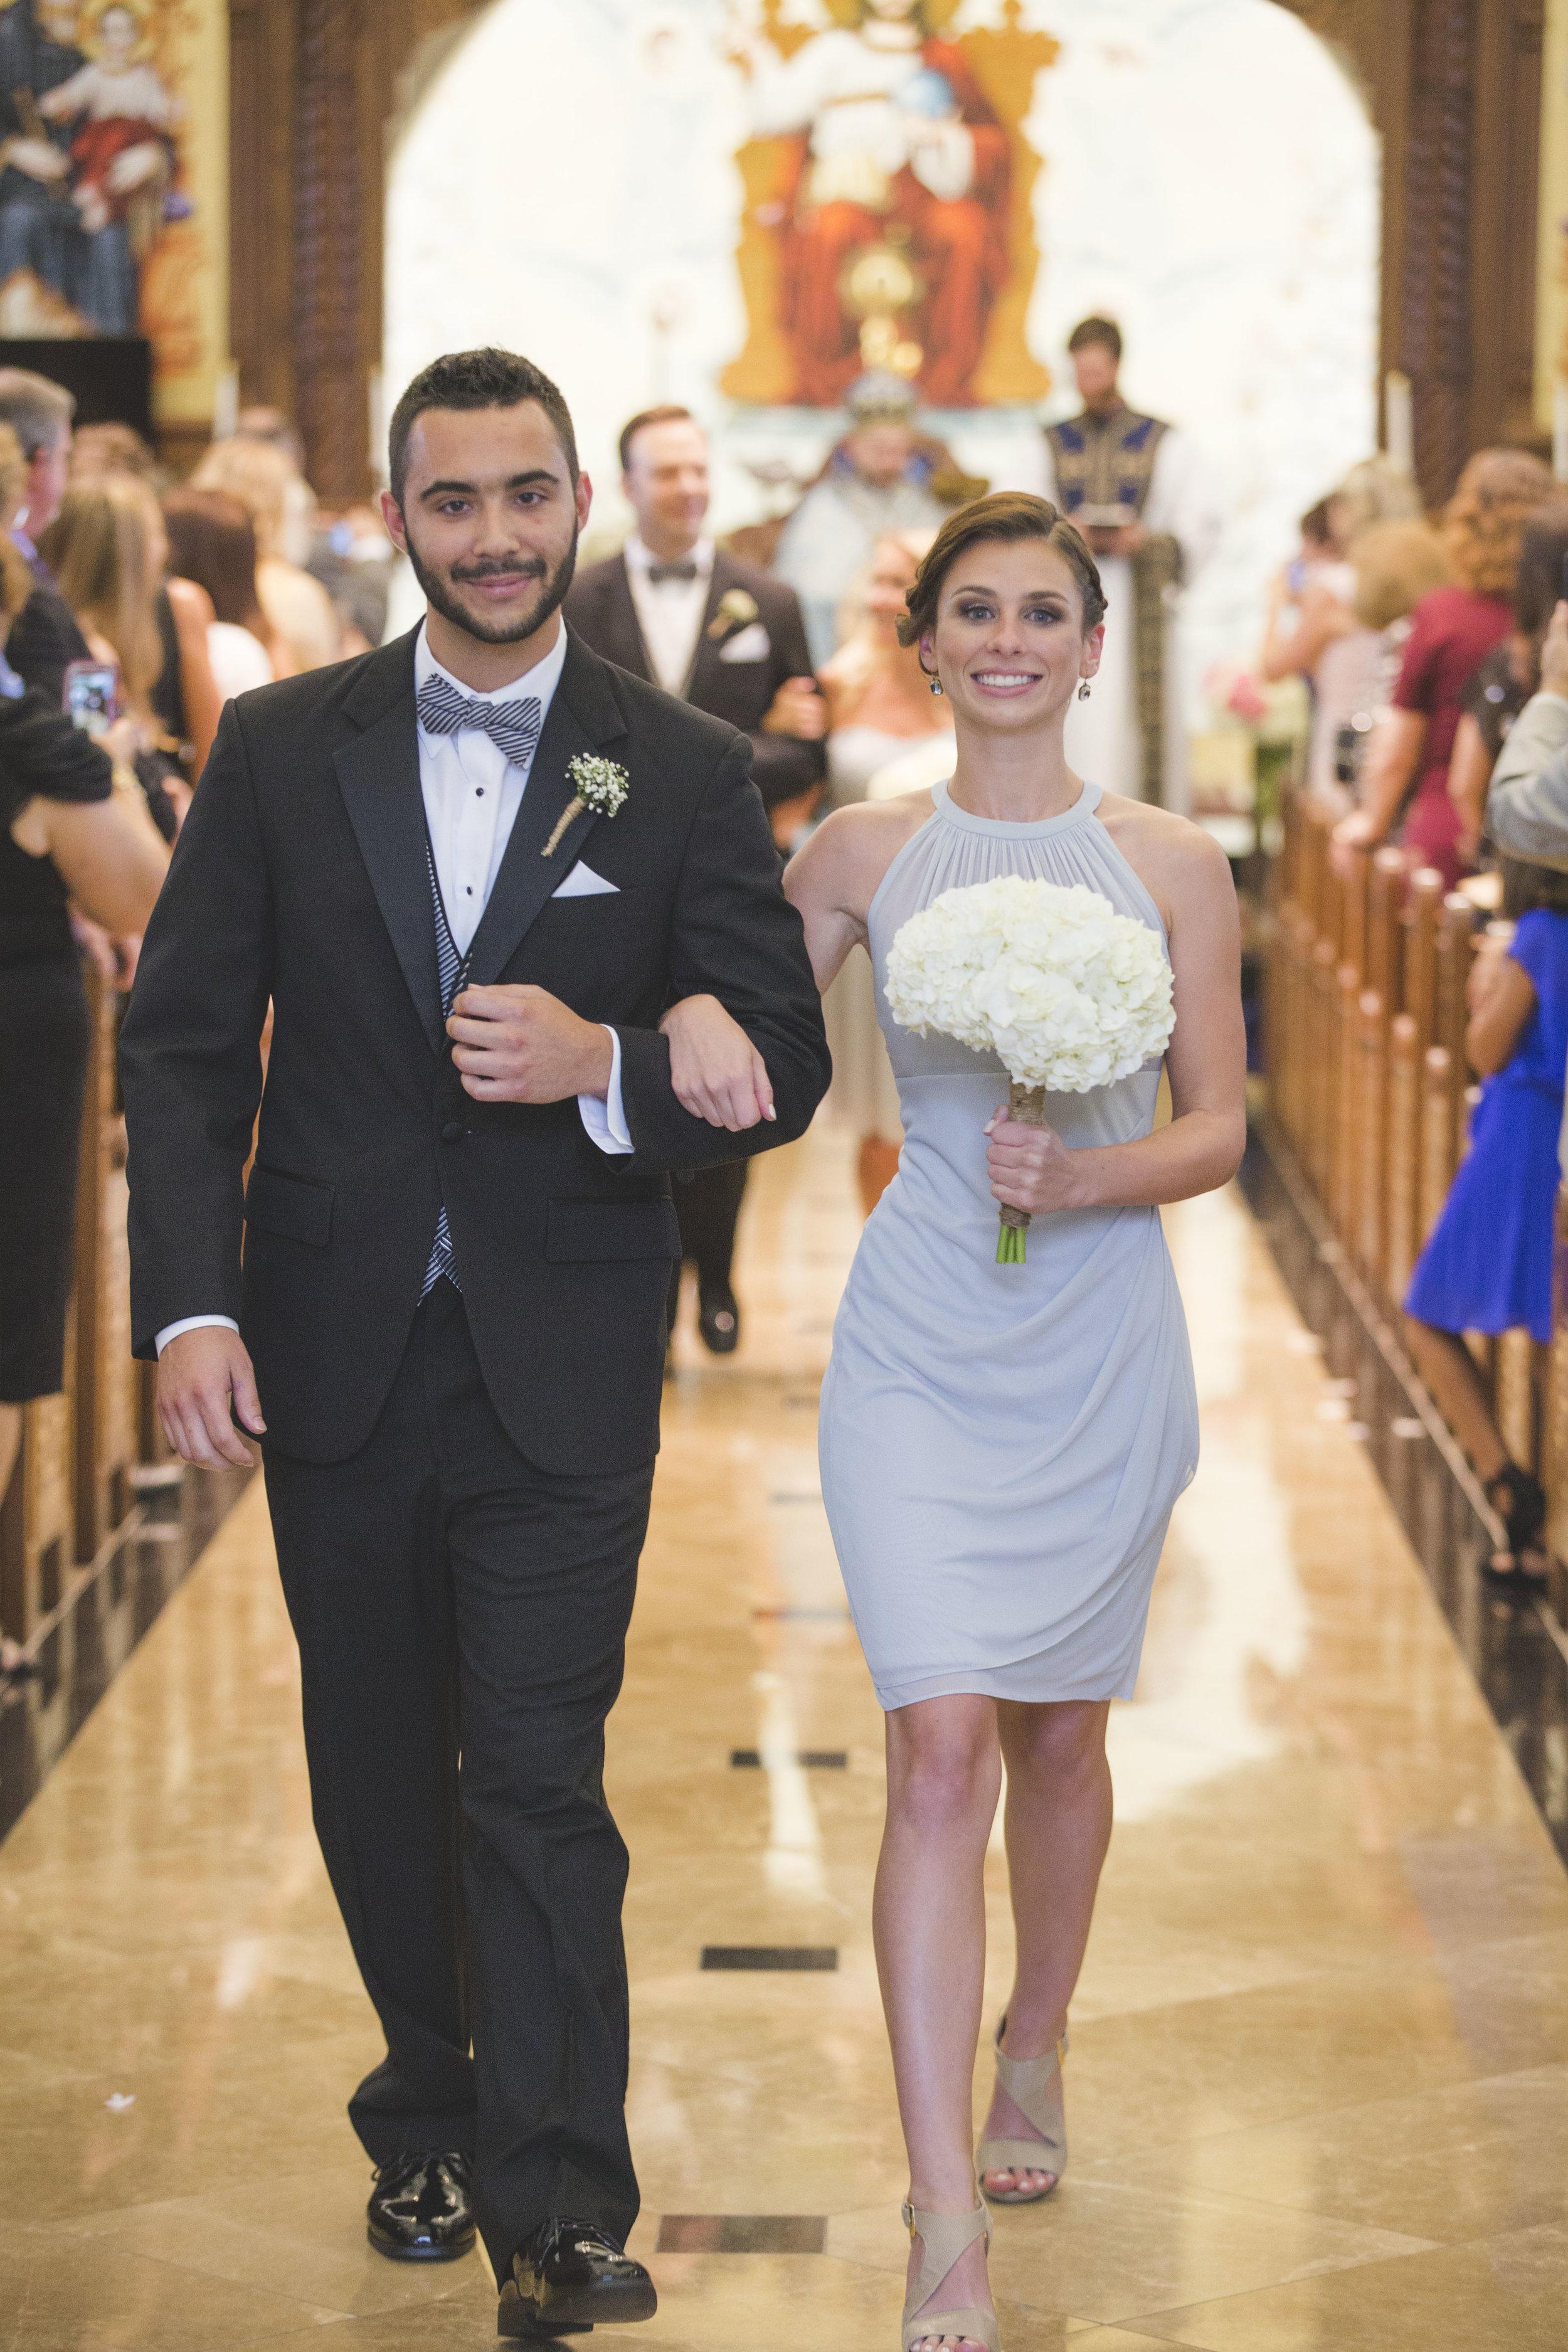 ATGI_Magali & Josh Wedding_2S8A0805.jpg